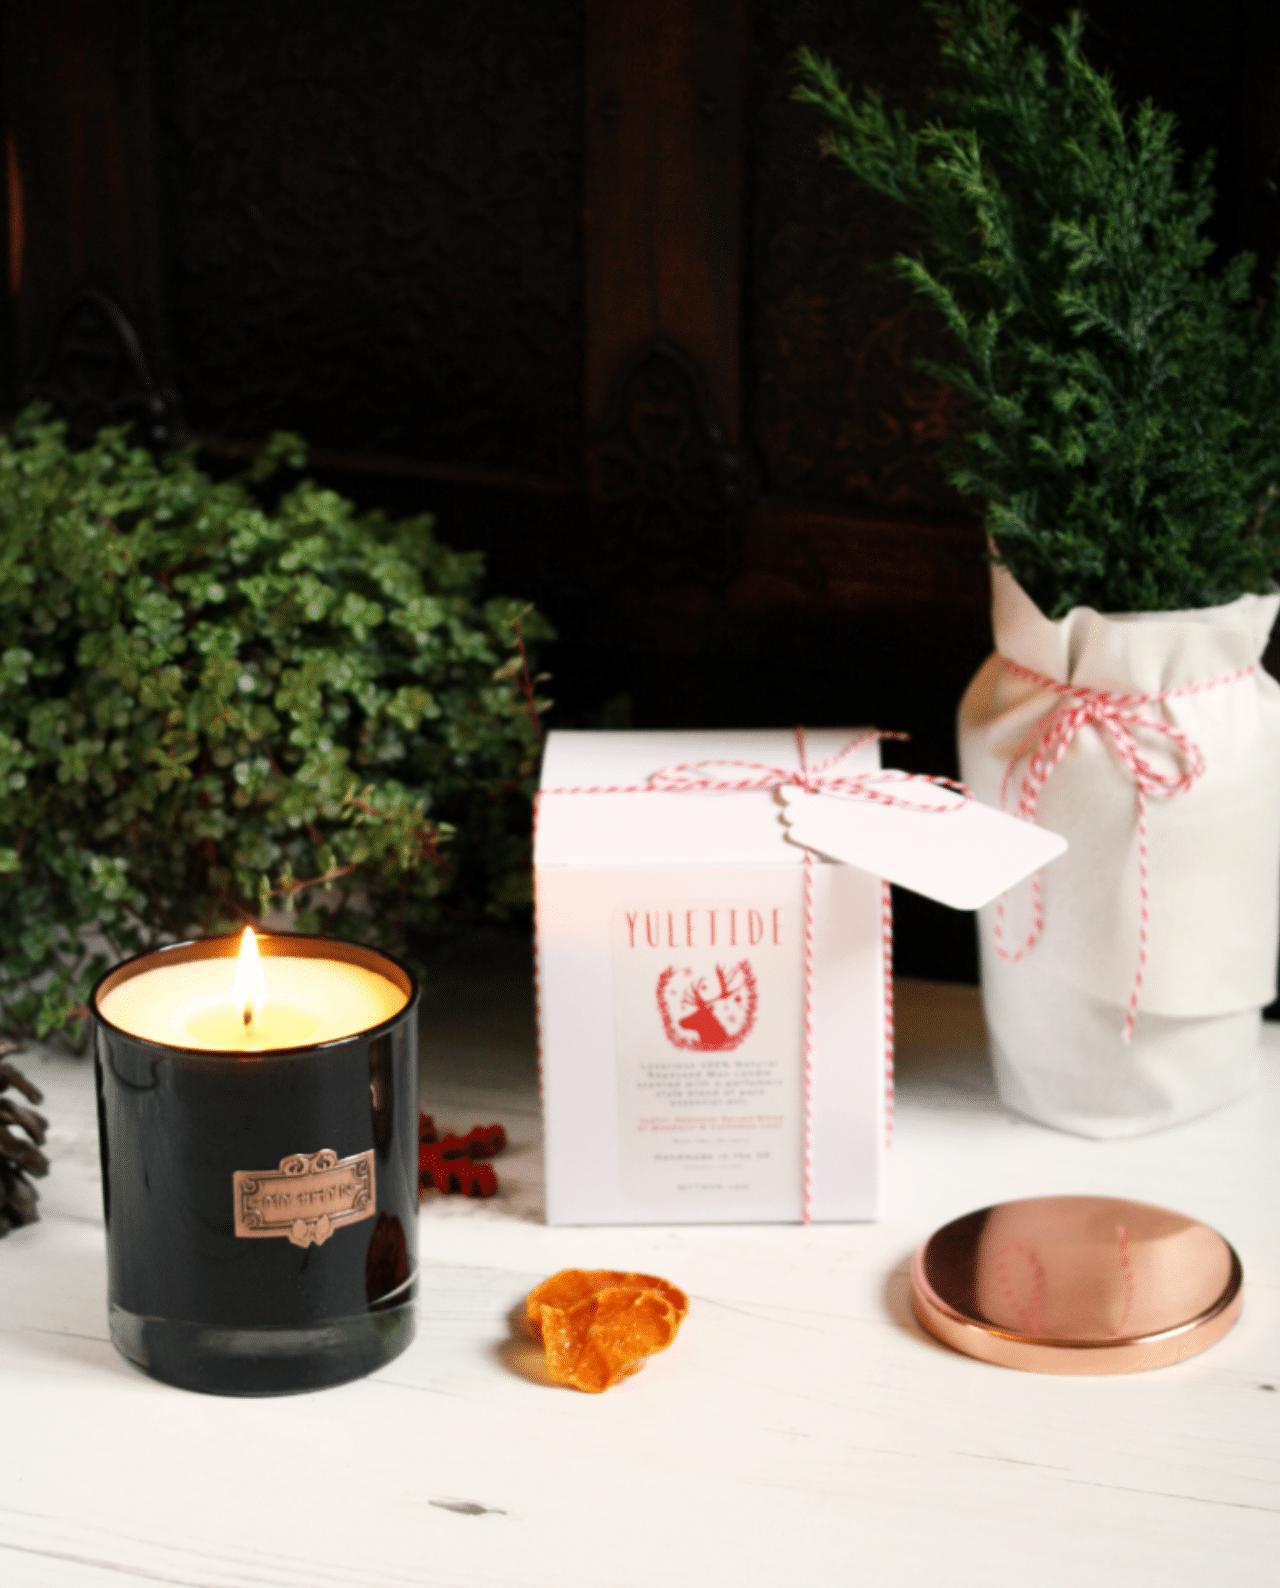 MYTHYN Yuletide Christmas Candle